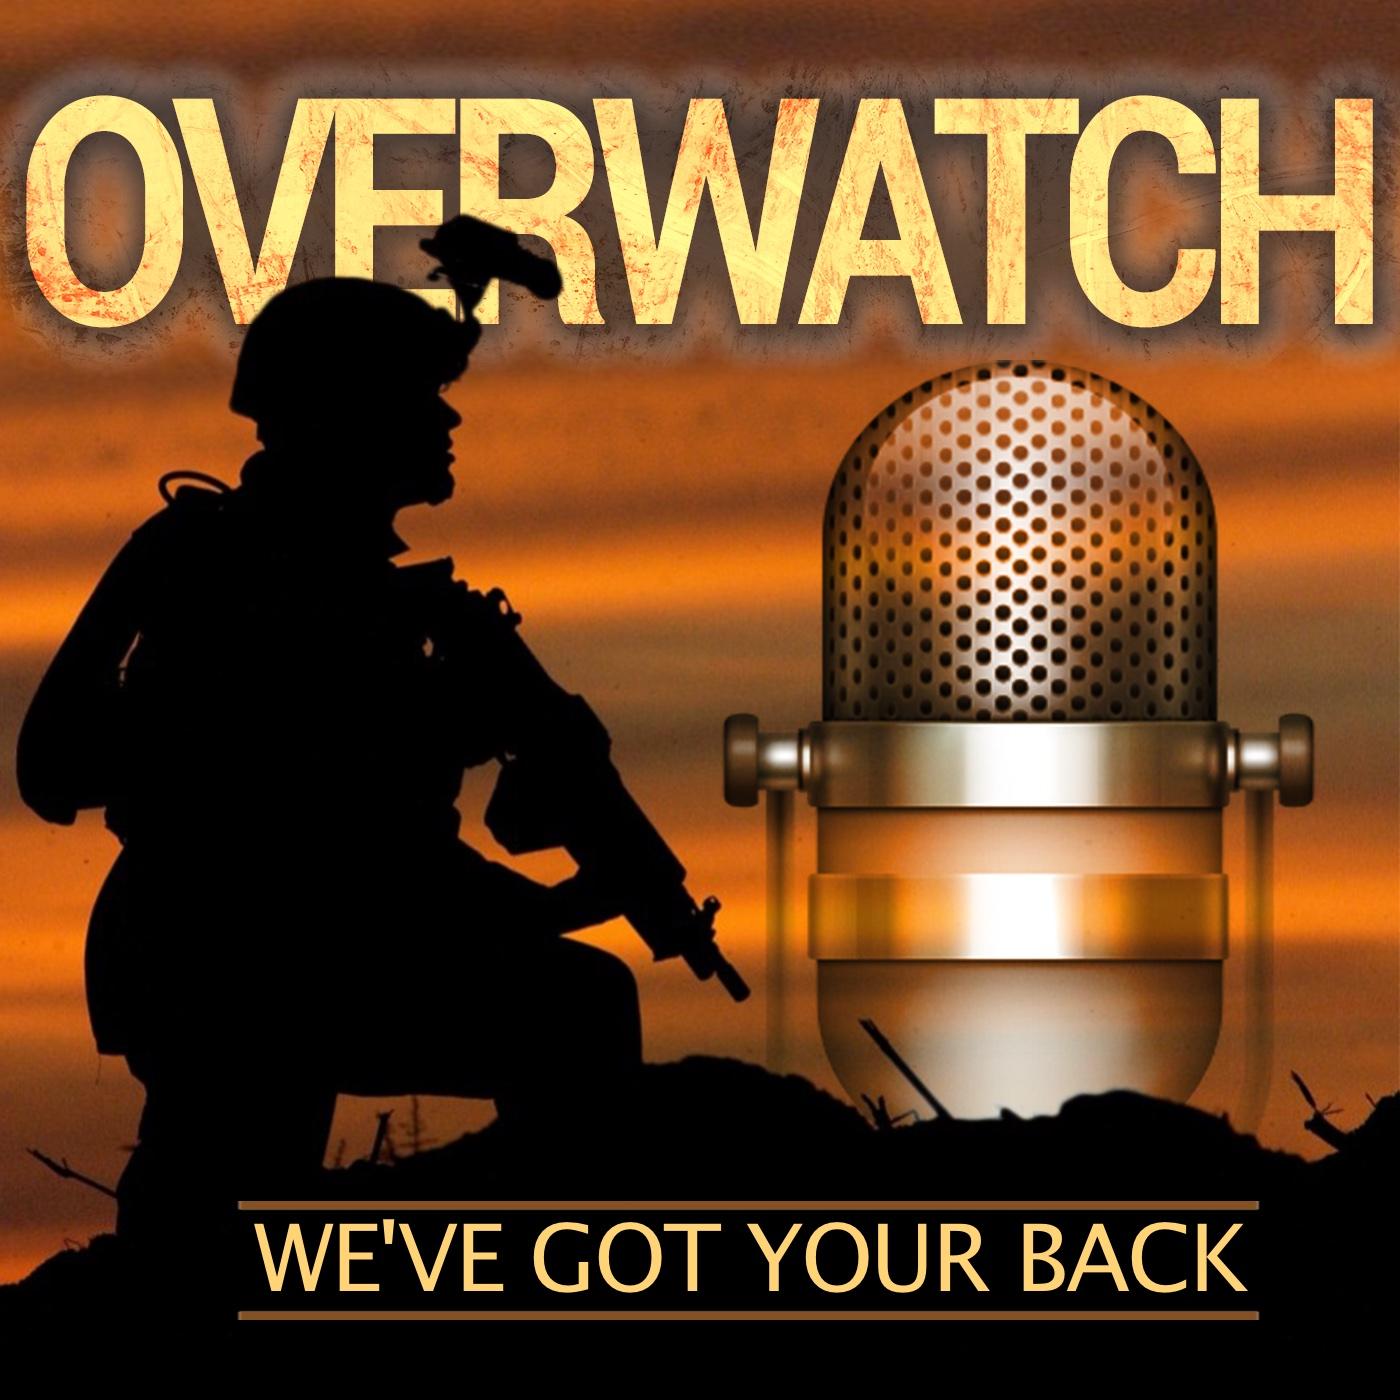 <![CDATA[Overwatch | We've Got Your Back]]>